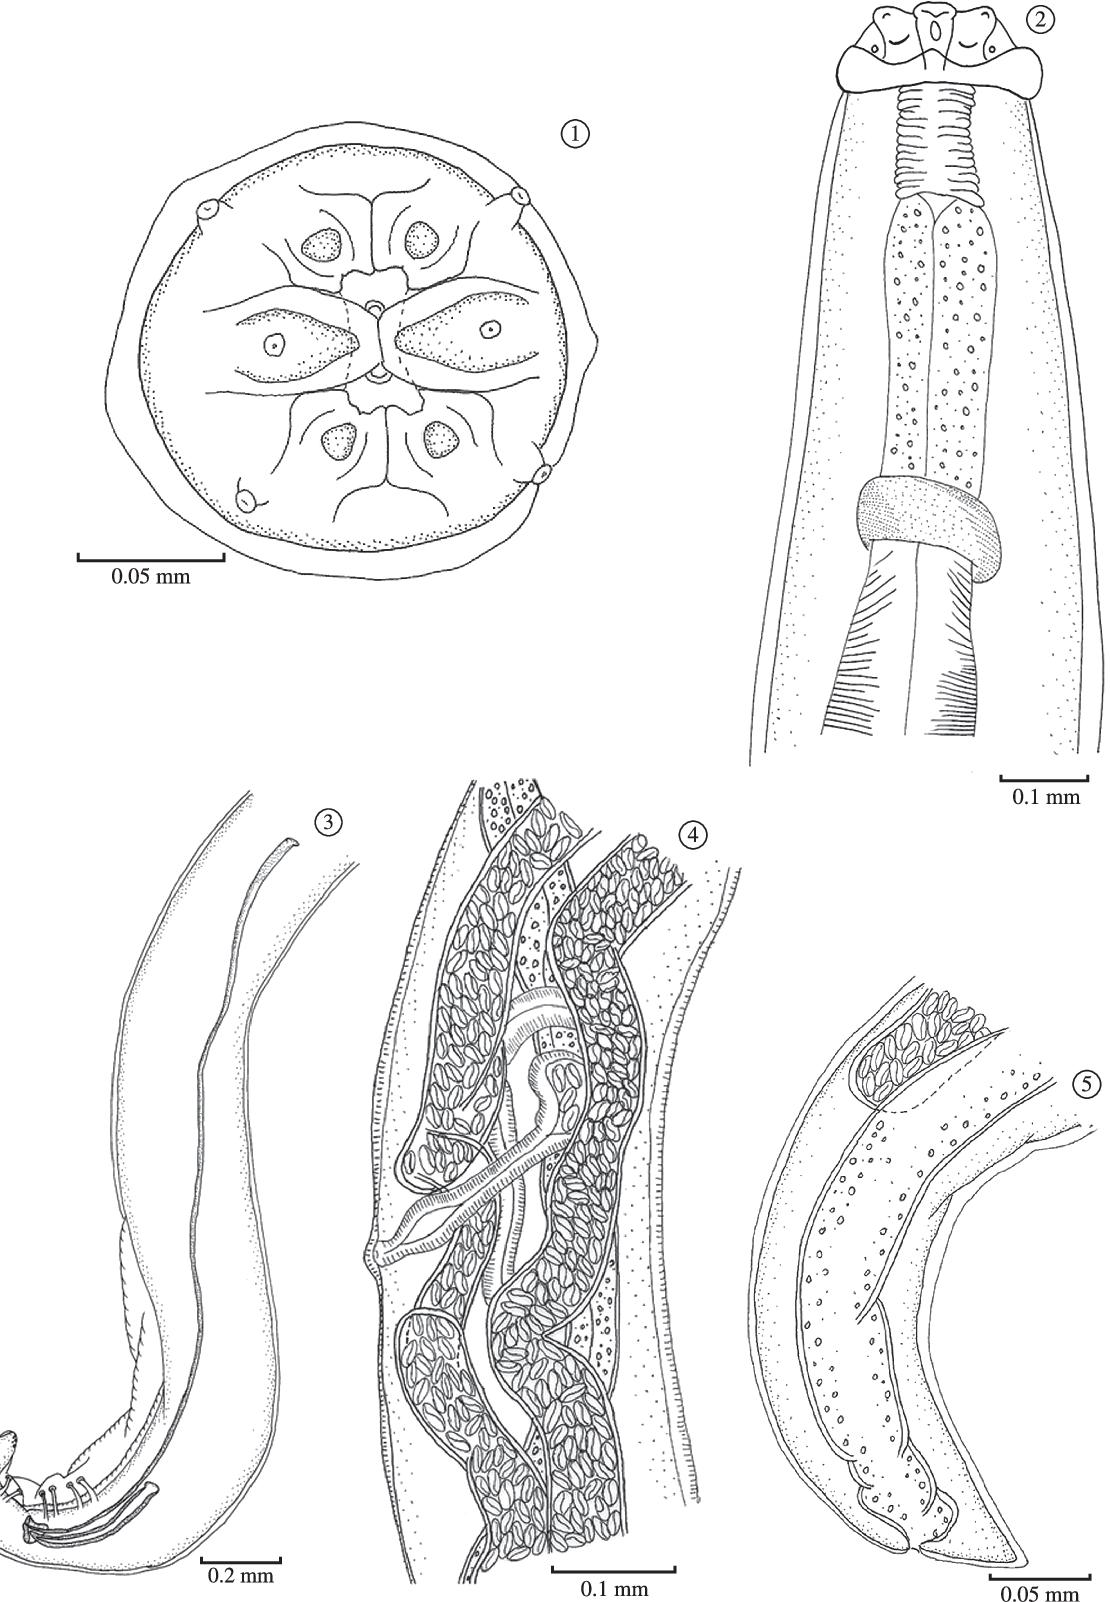 figure 1‑5